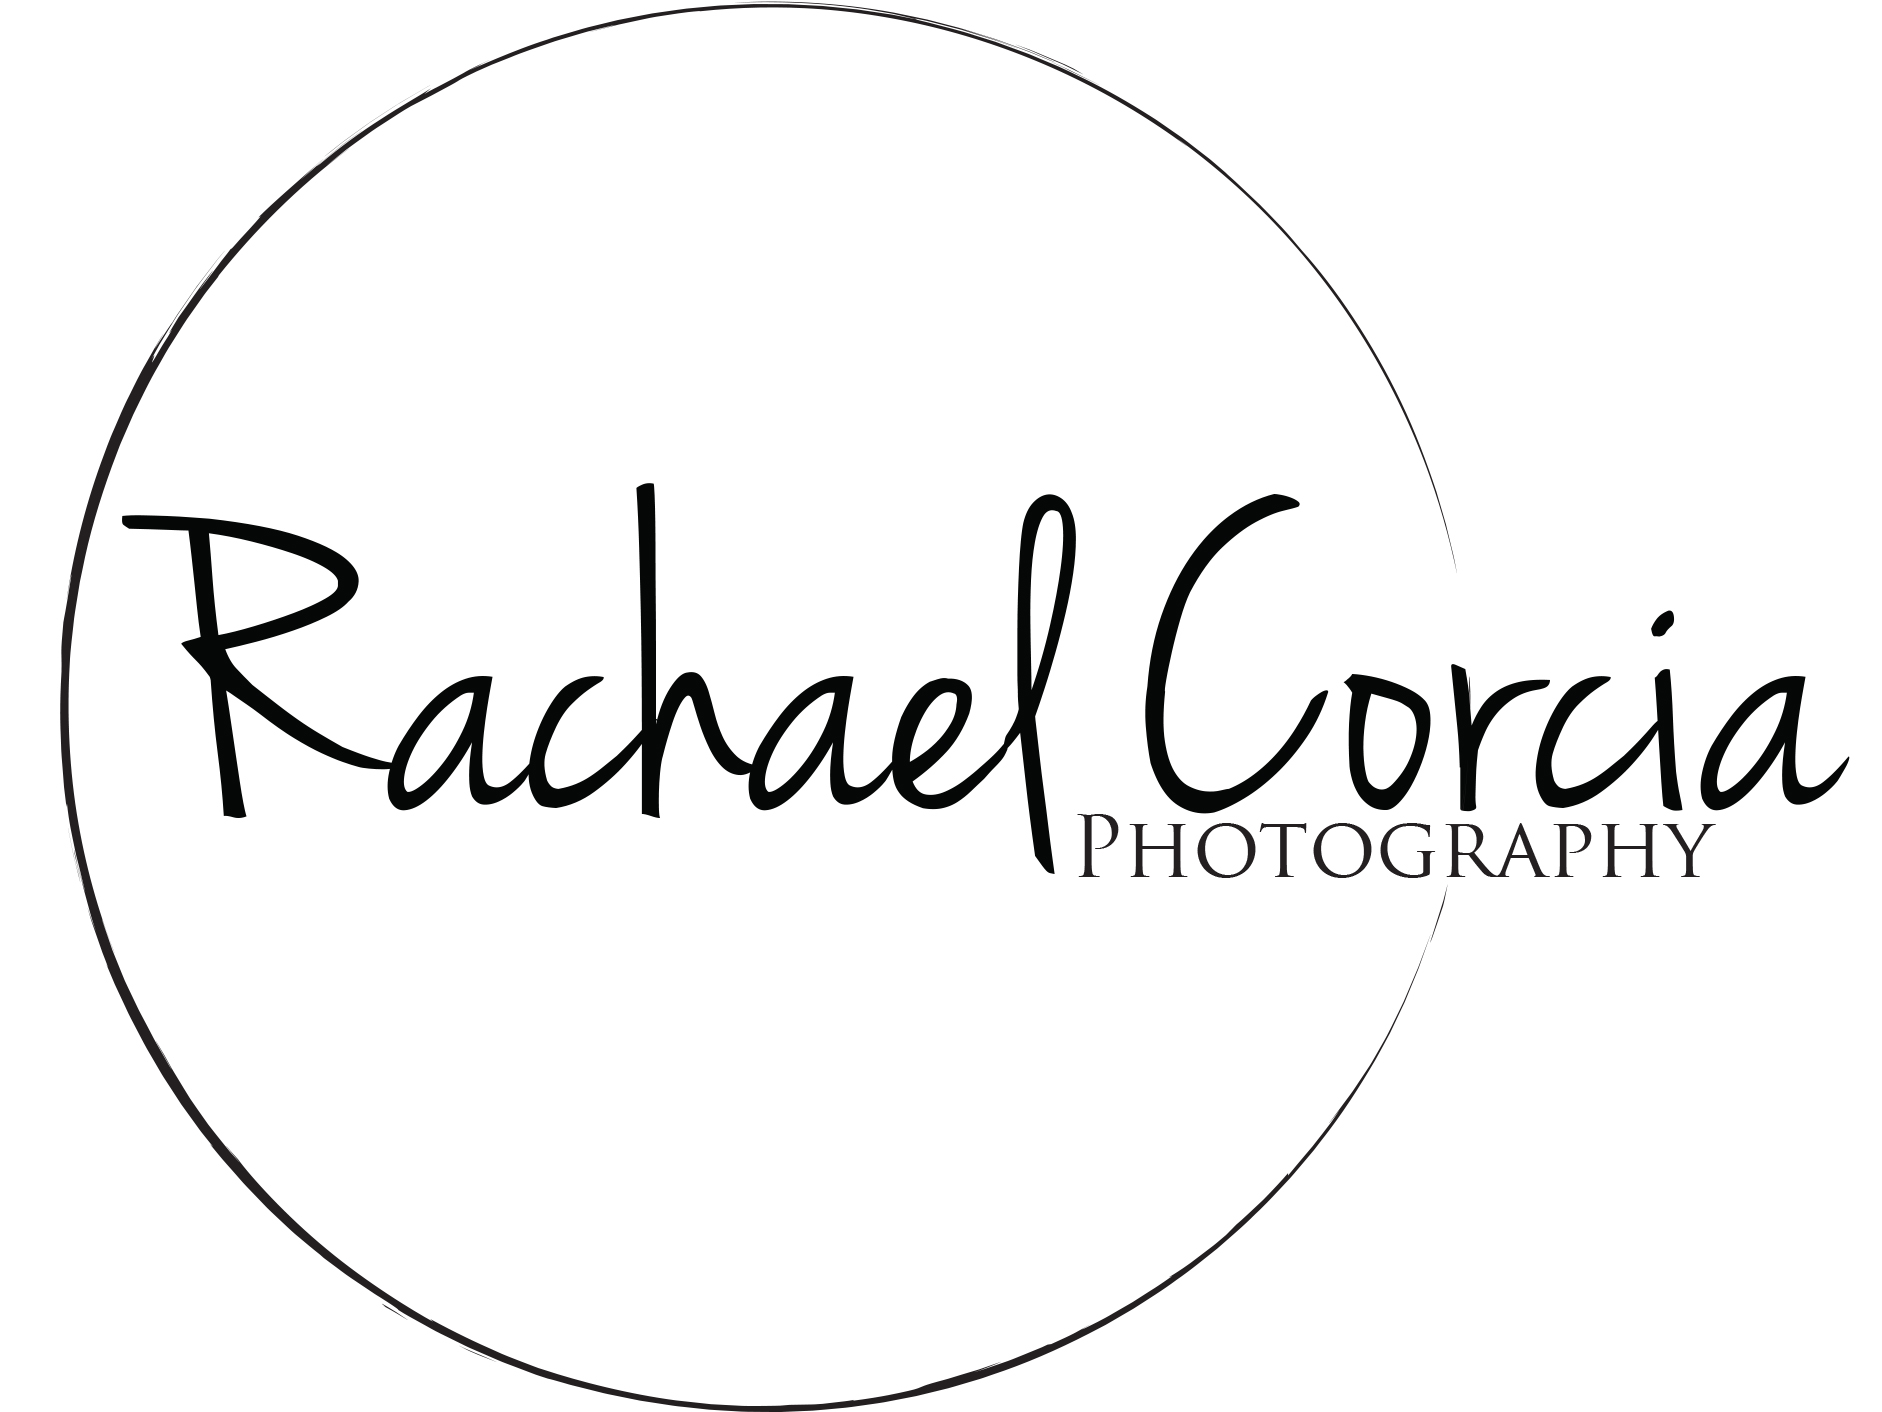 Rachael Corcia Photography